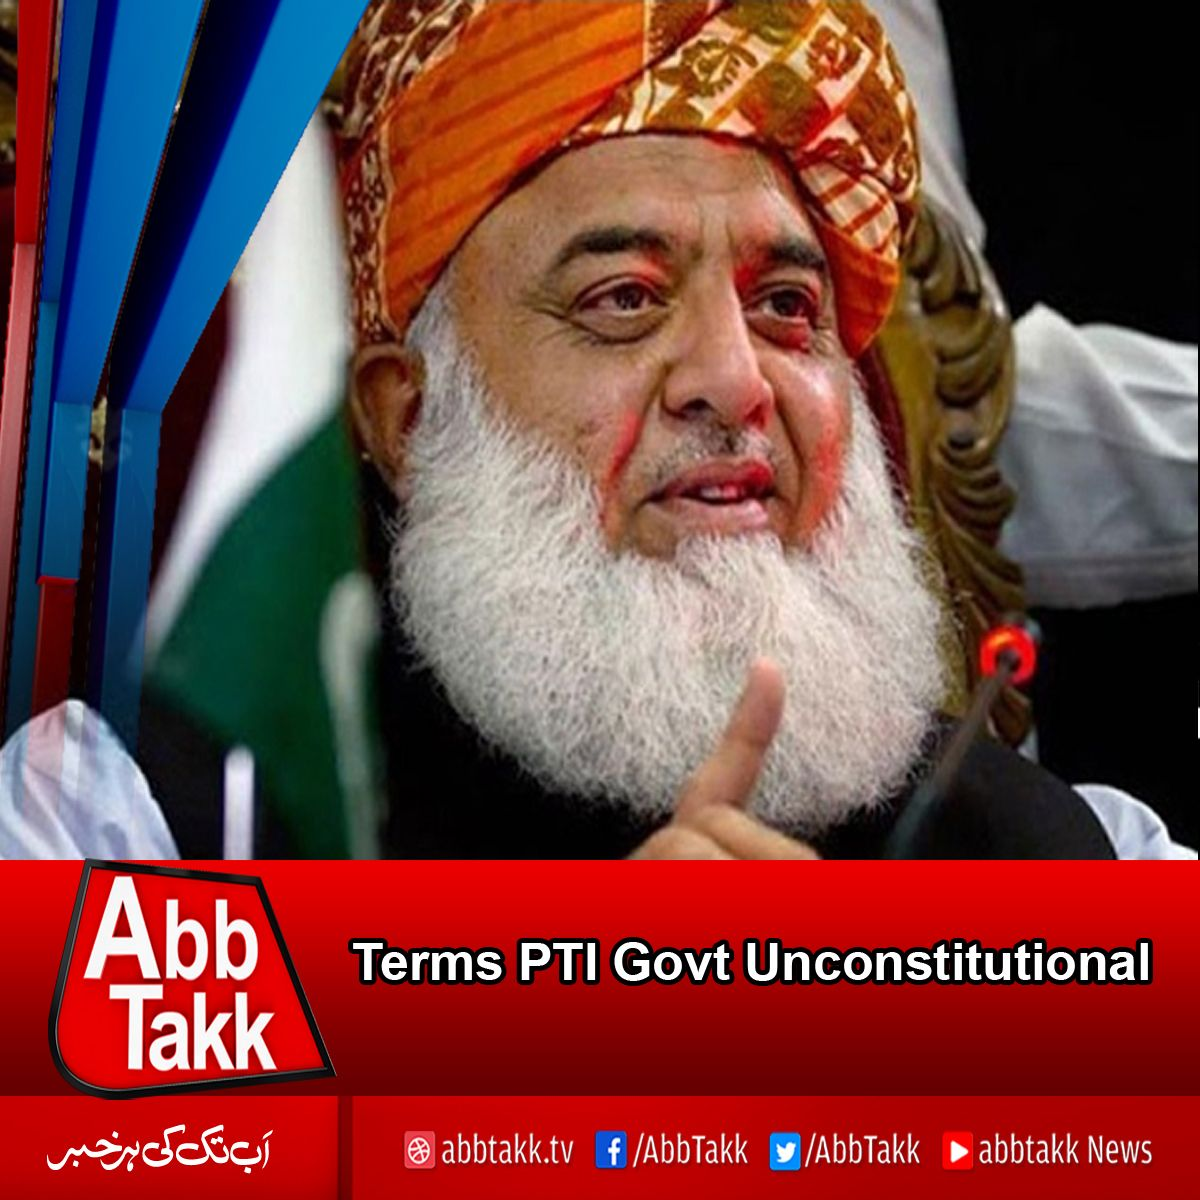 Pin By Majid Siddiqui On Abb Takk Tv World News Today Headlines Today Resignation